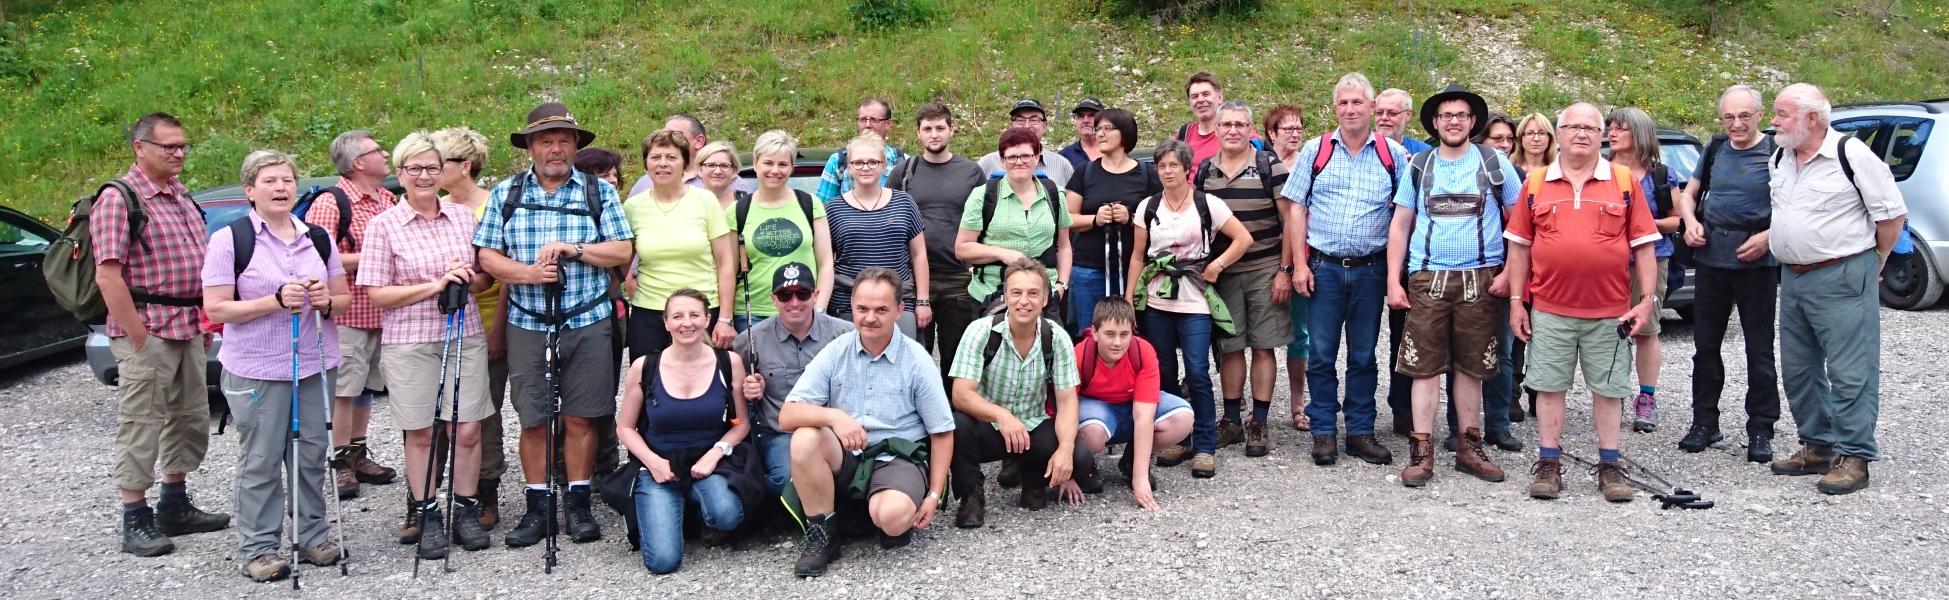 Vereinsausflug Juni 2016 ins Lechtal (Tirol)